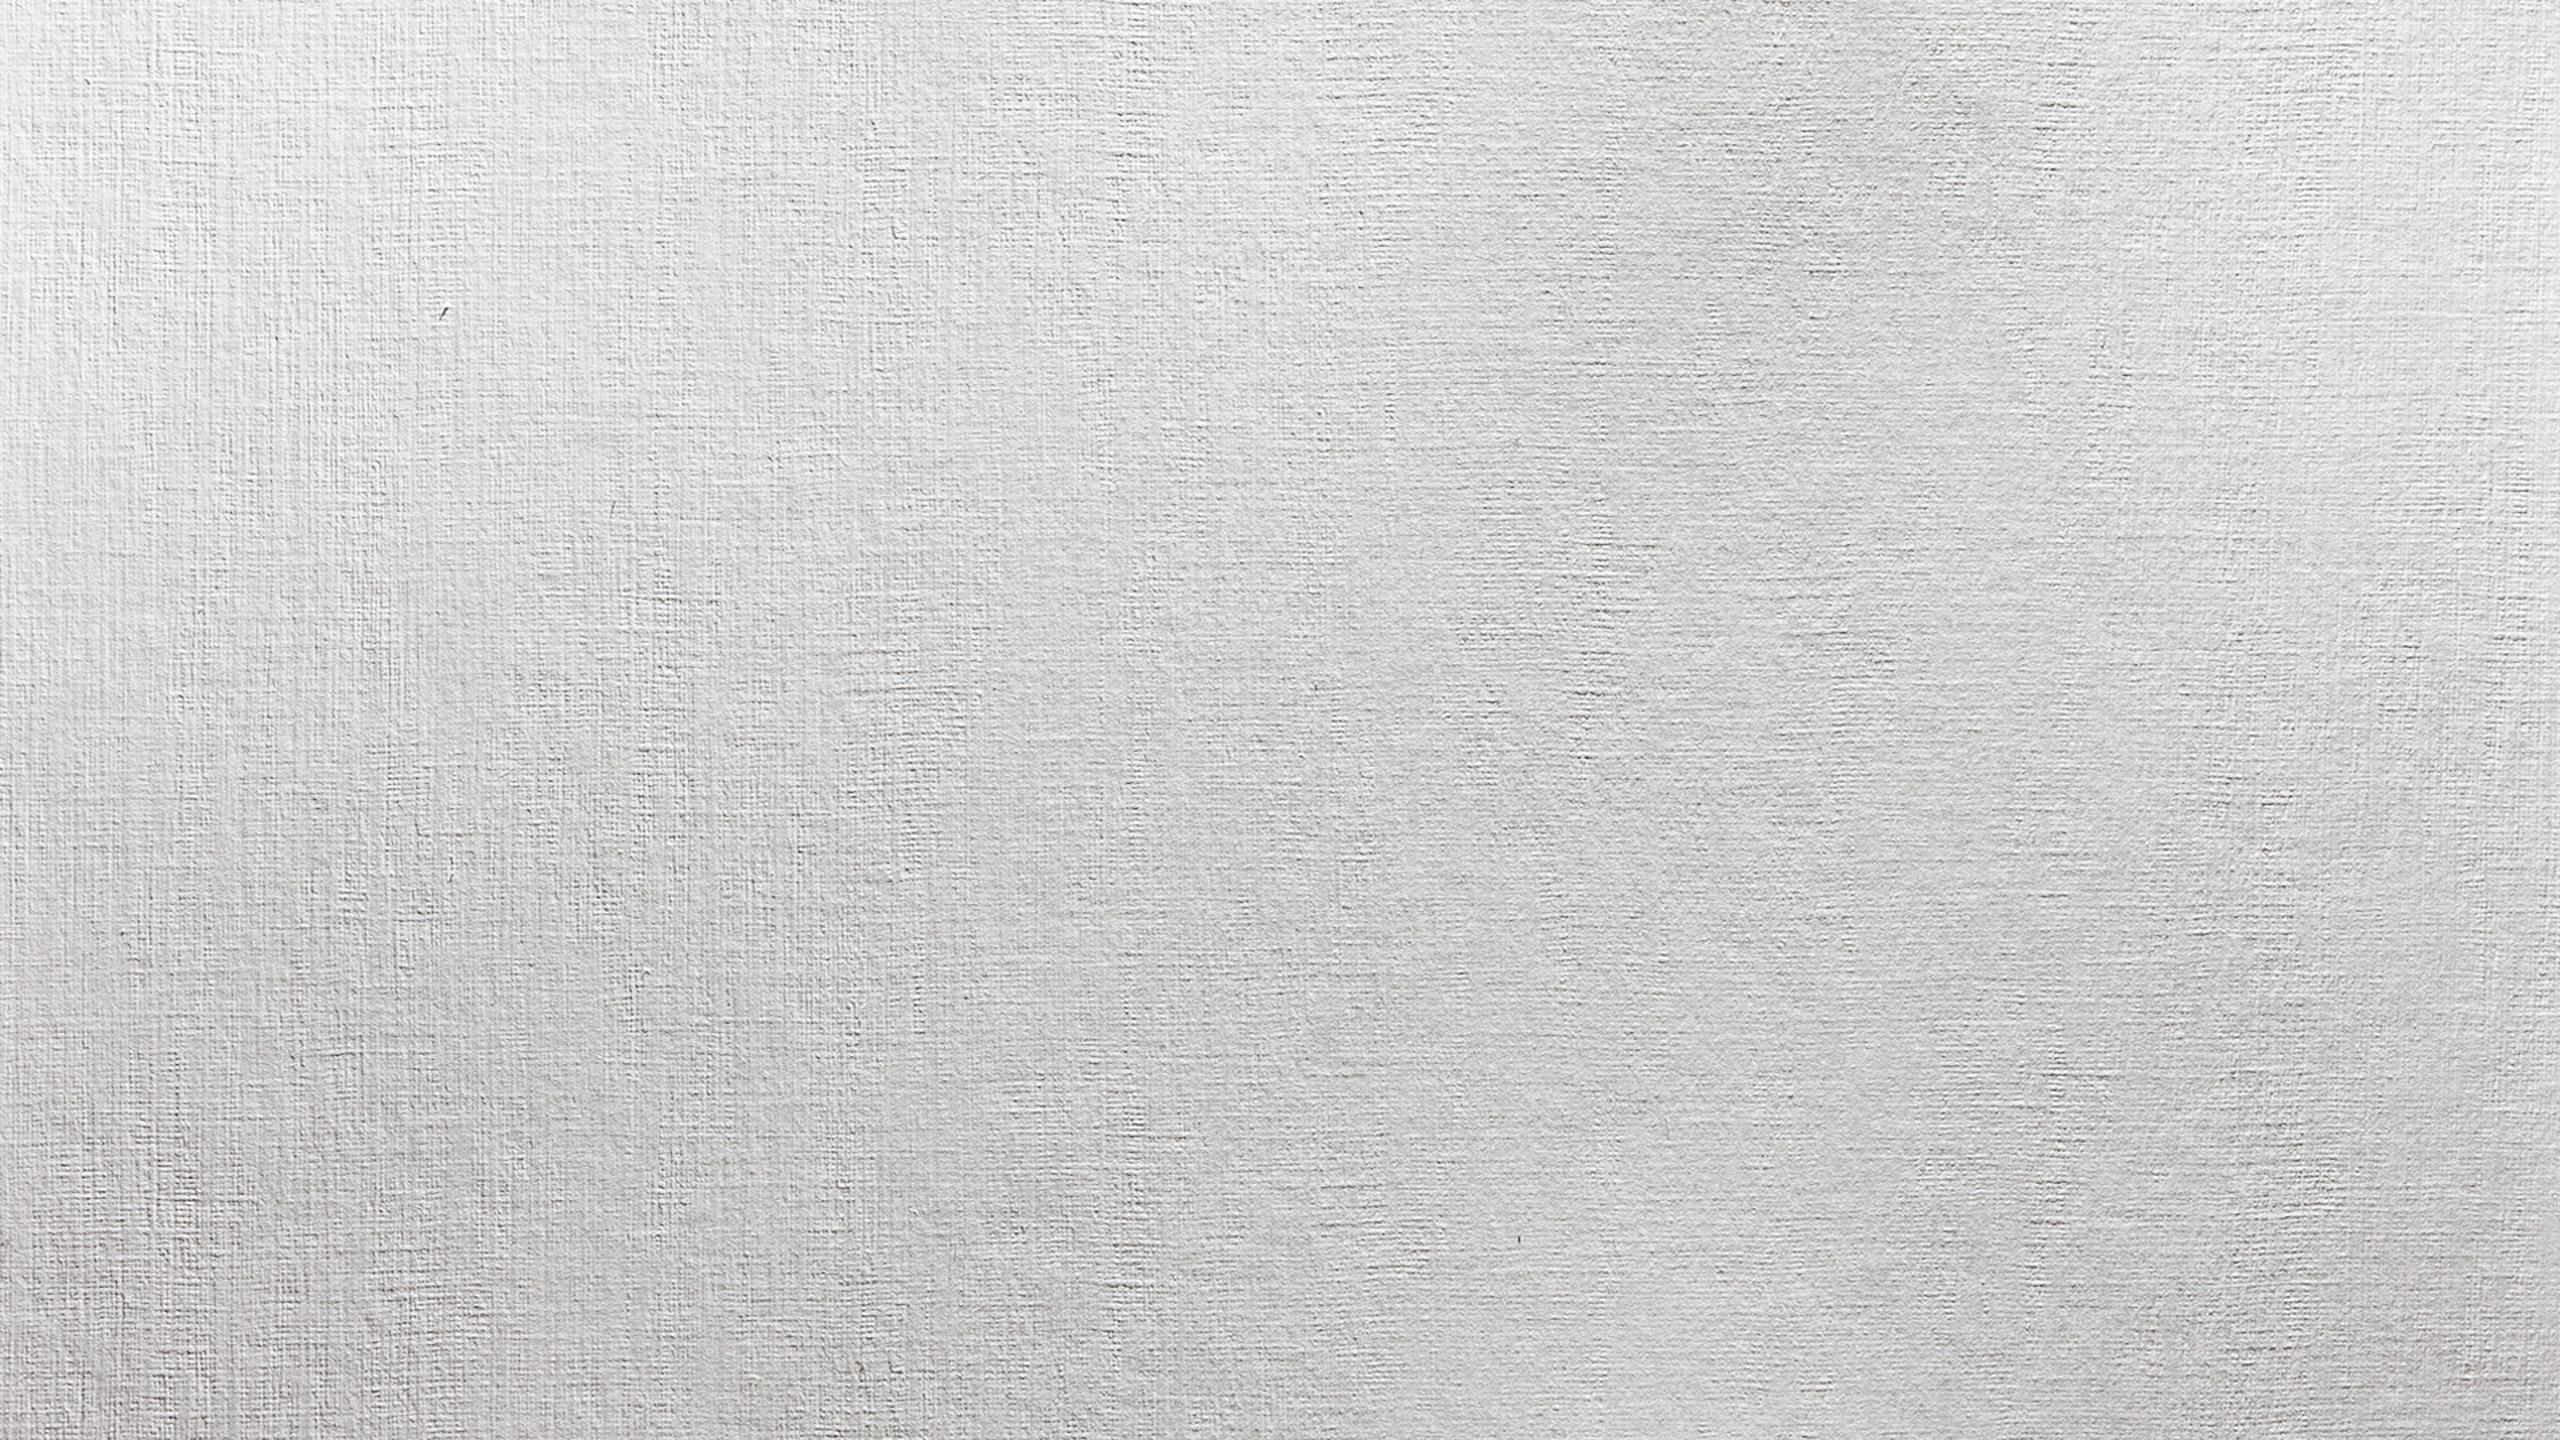 Metallic Animal Print Wallpaper Silver Textured Wallpapers Group 50